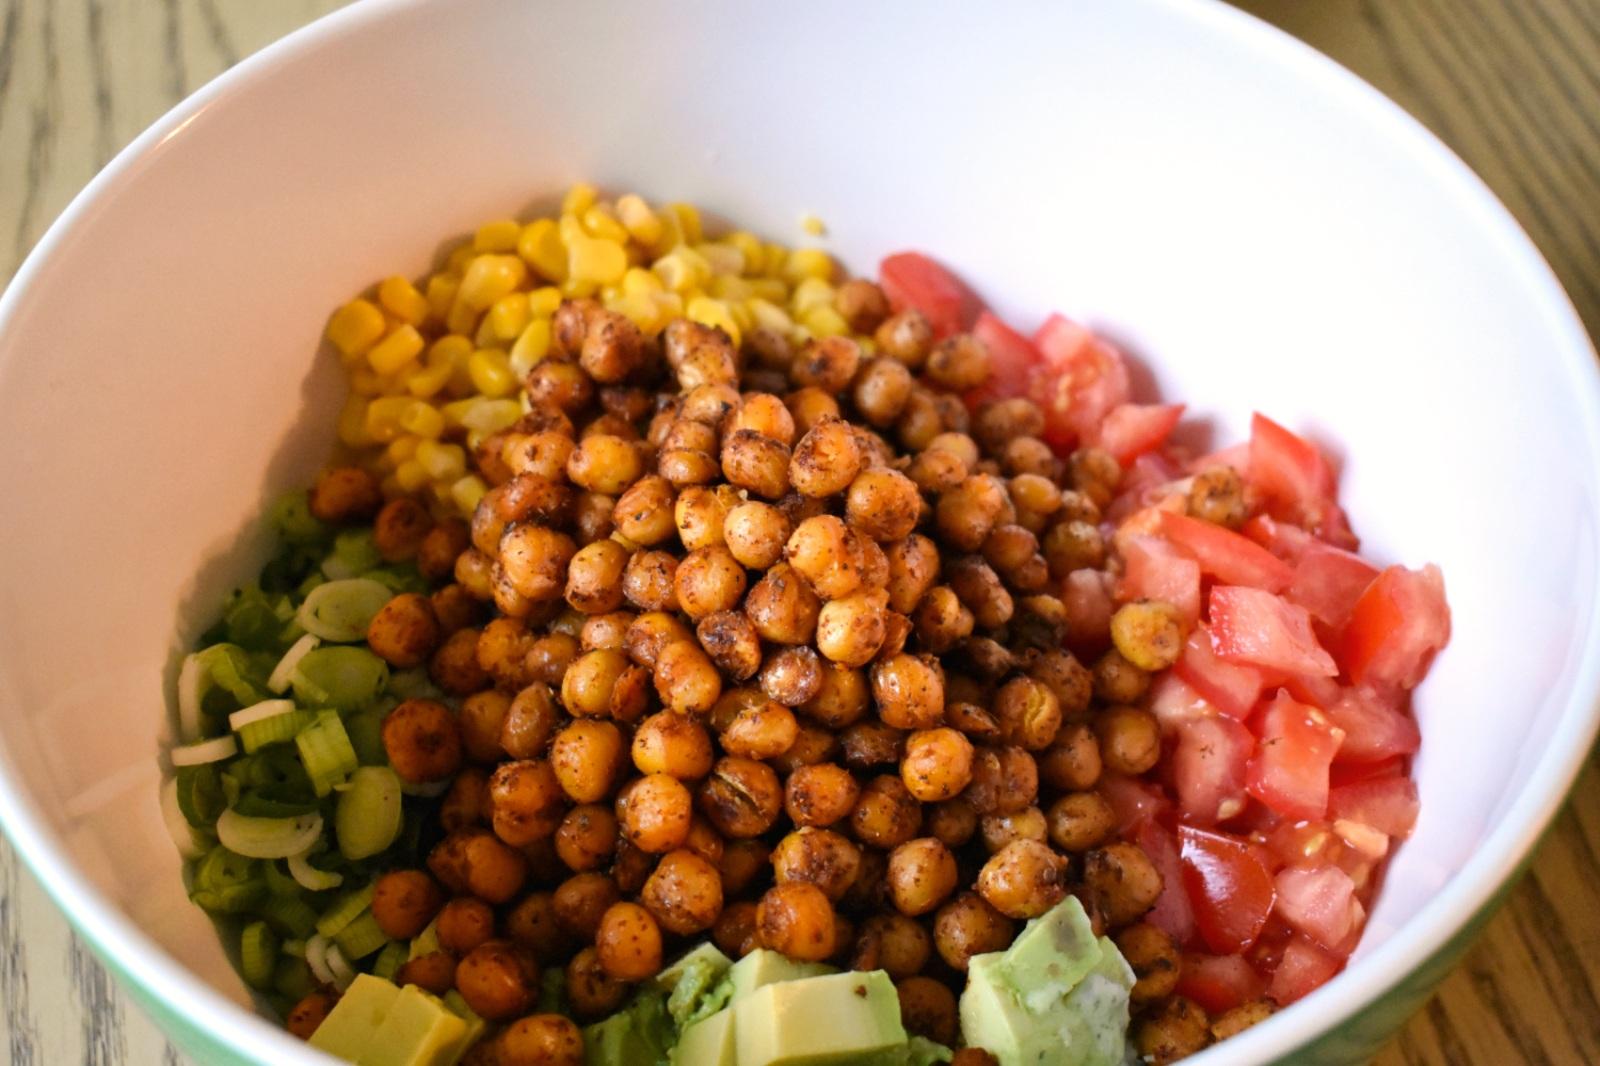 Salade de quinoa tex mex - Auboutdelalangue.com (4)